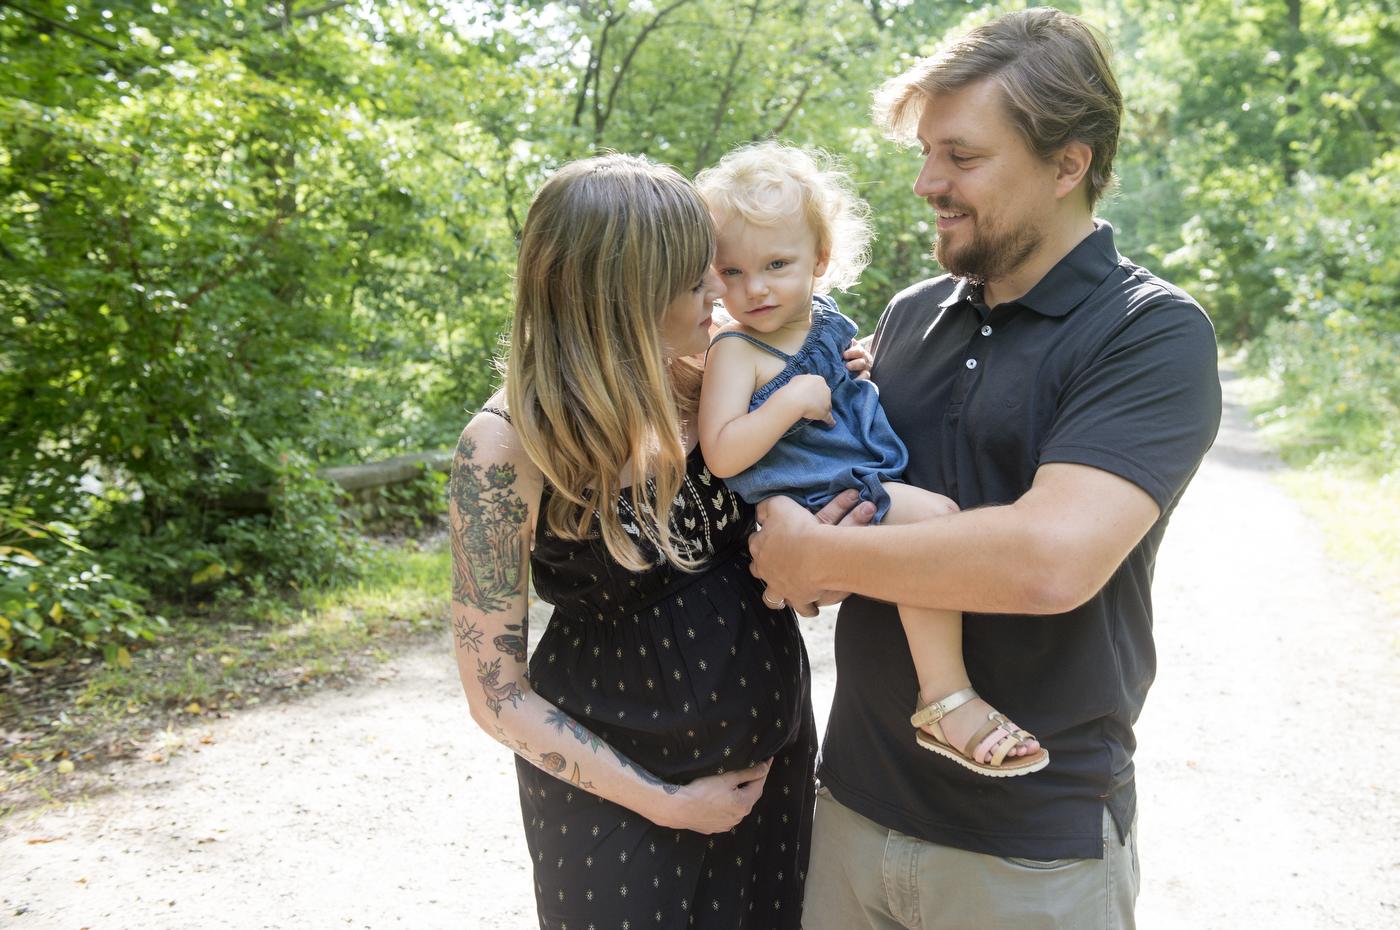 081416_Martin&Kelly&Alice&Baby_blog_78.JPG